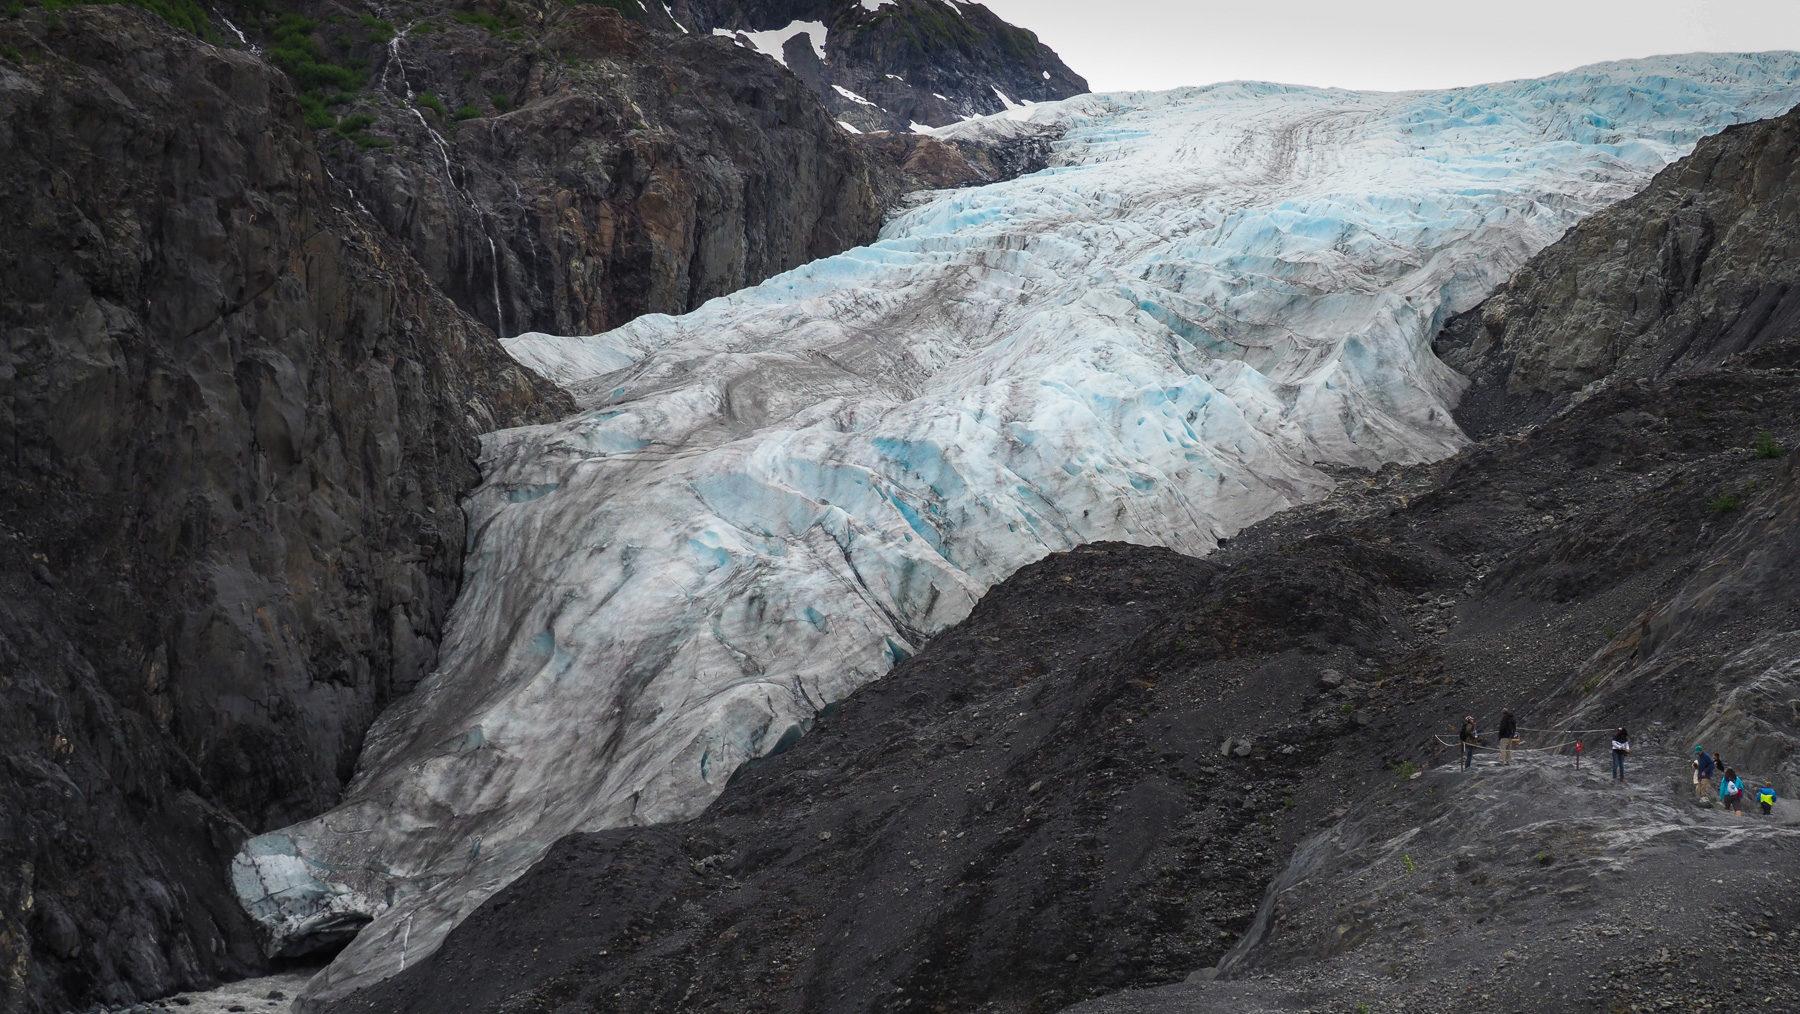 man kann sehr nahe an den Gletscher heranlaufen